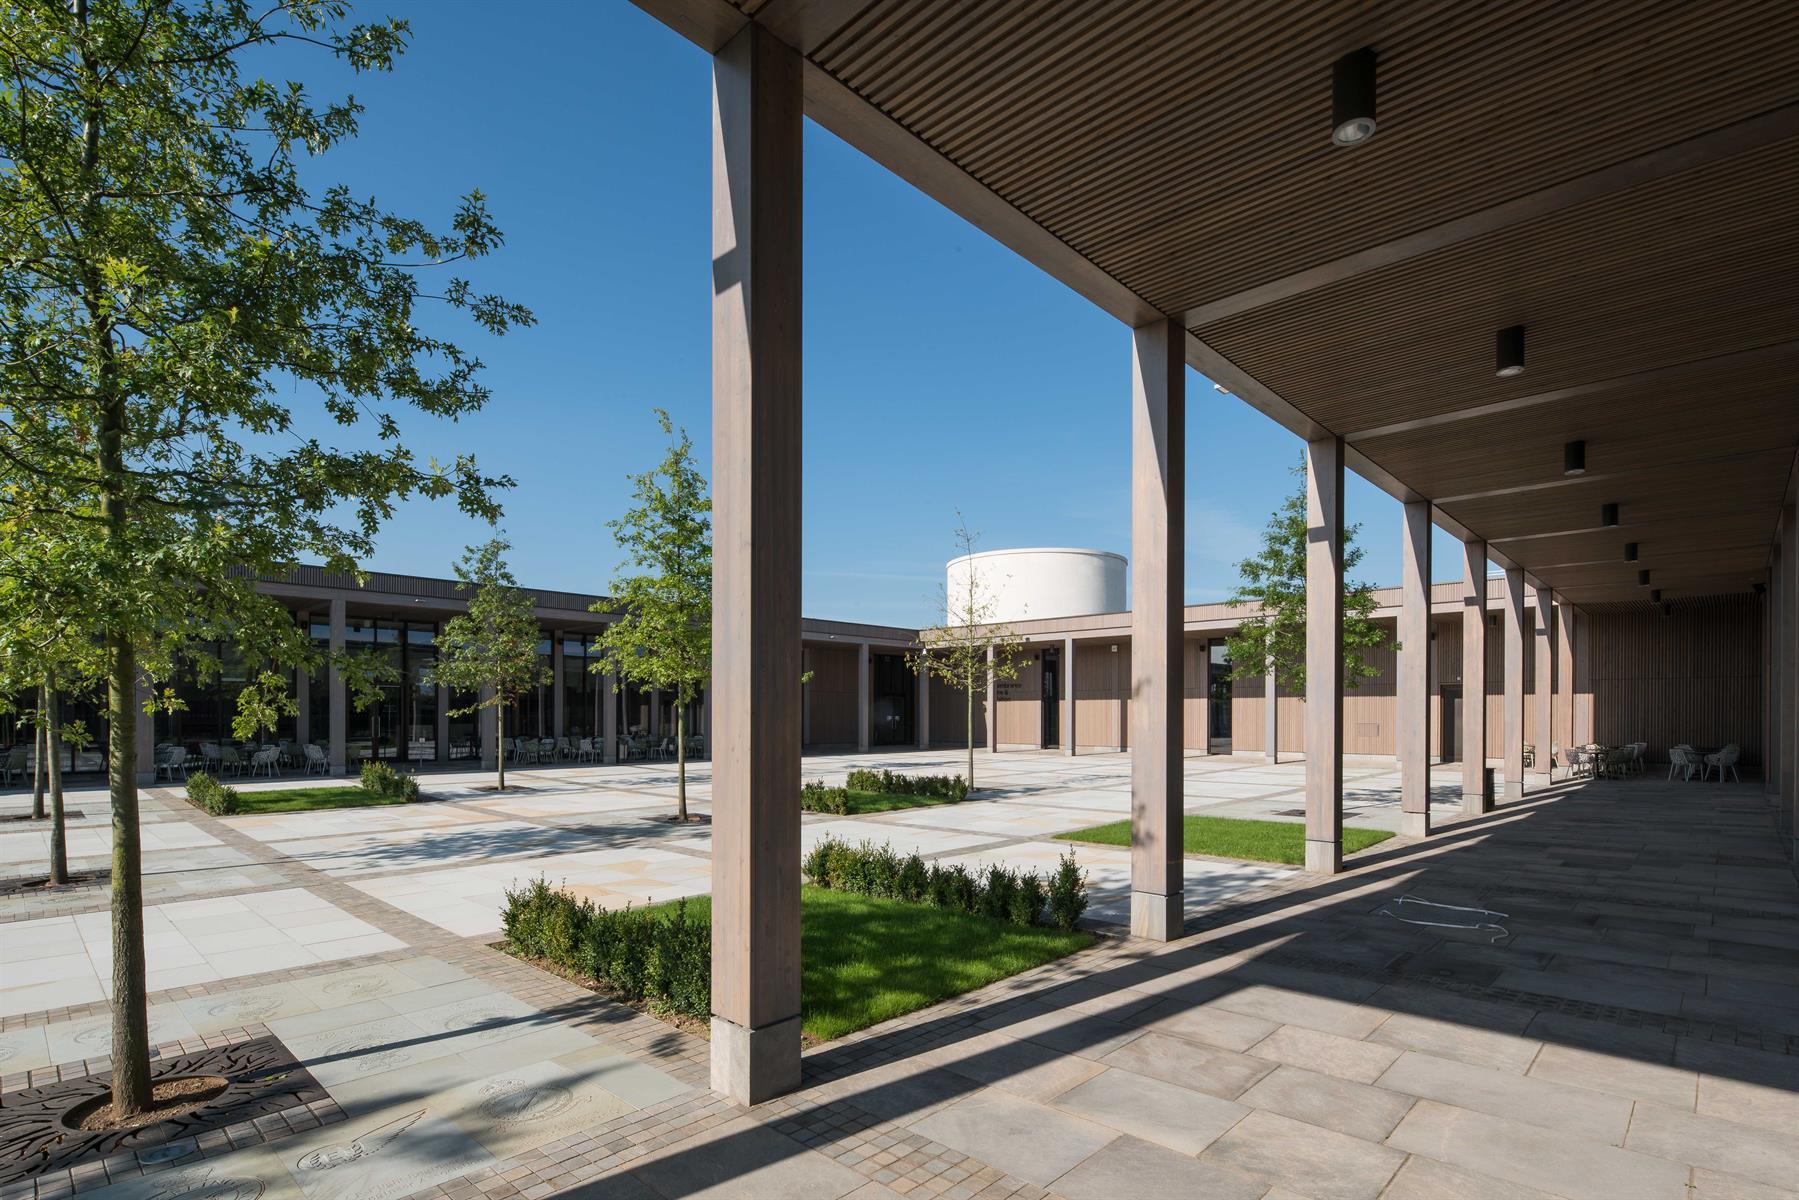 National Memorial Arboretum Remembrance Centre